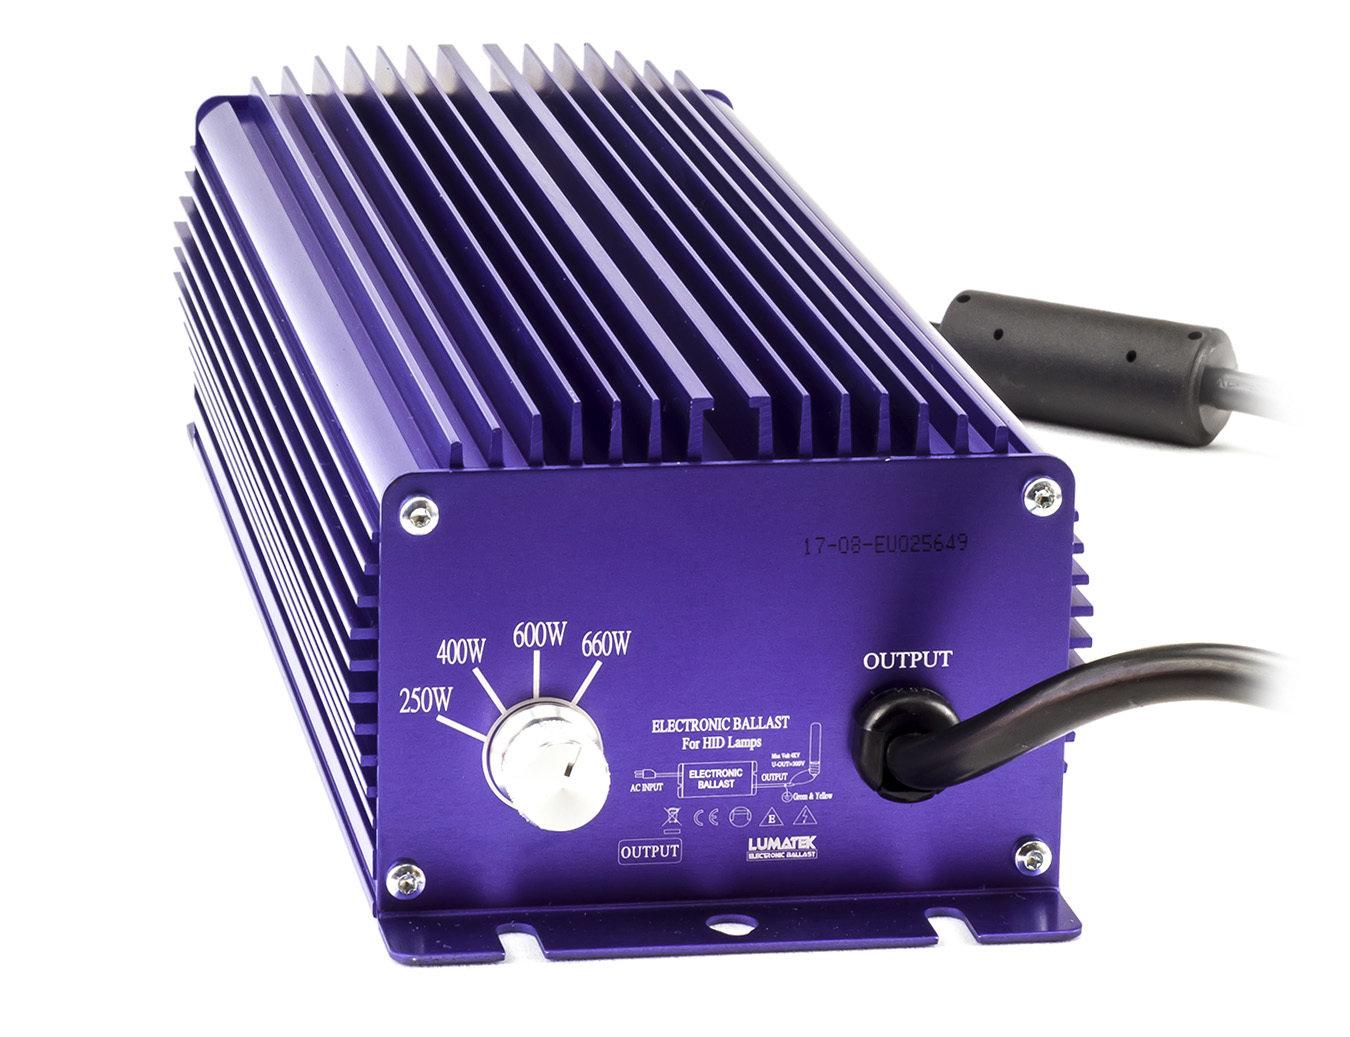 Балласт Lumatek 600-400-250W для HPS (ДНАТ) и MH (МГЛ) ламп